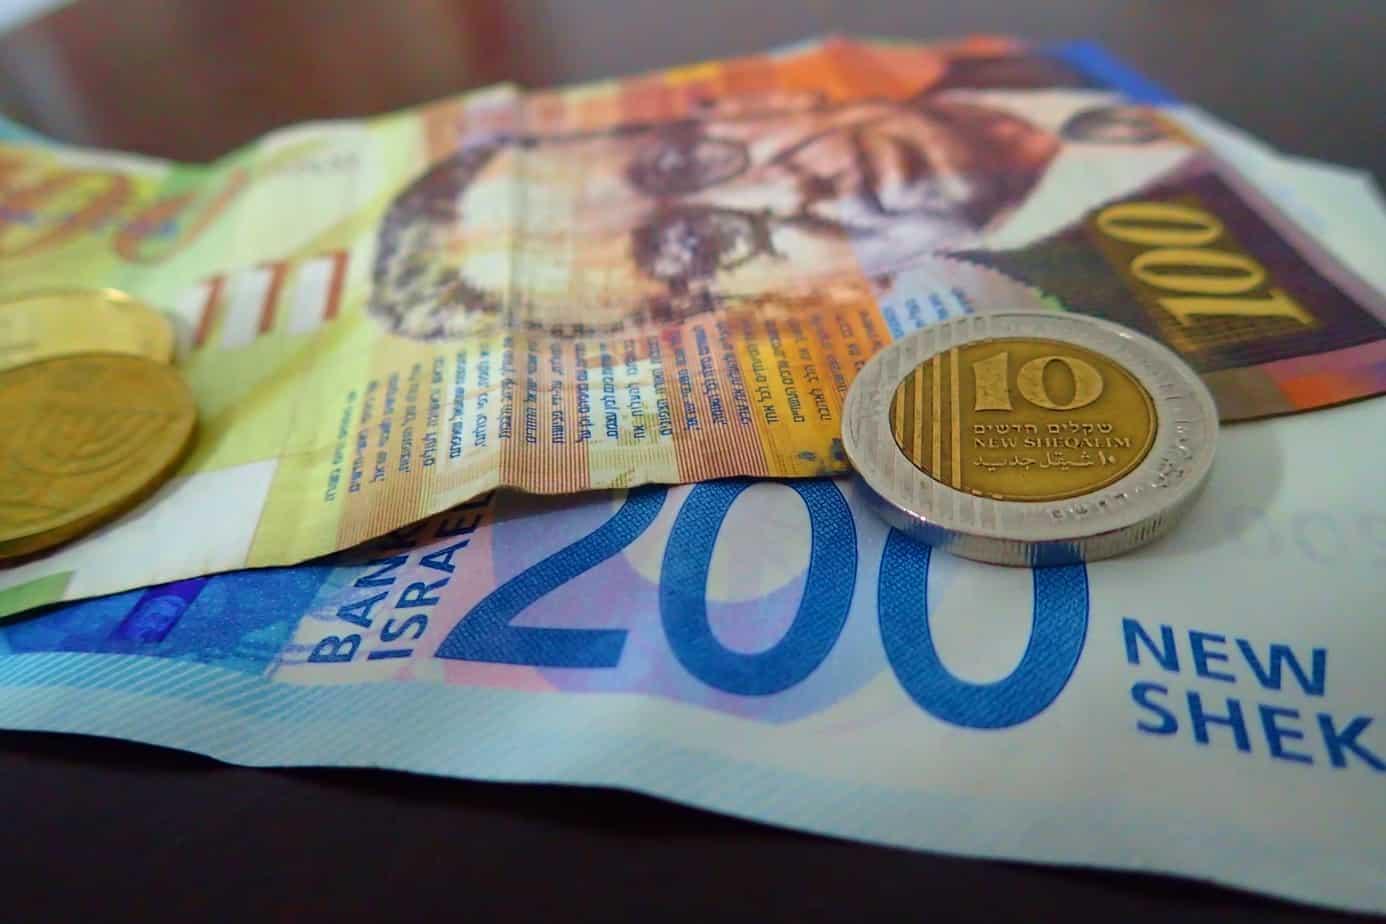 Money, shekels